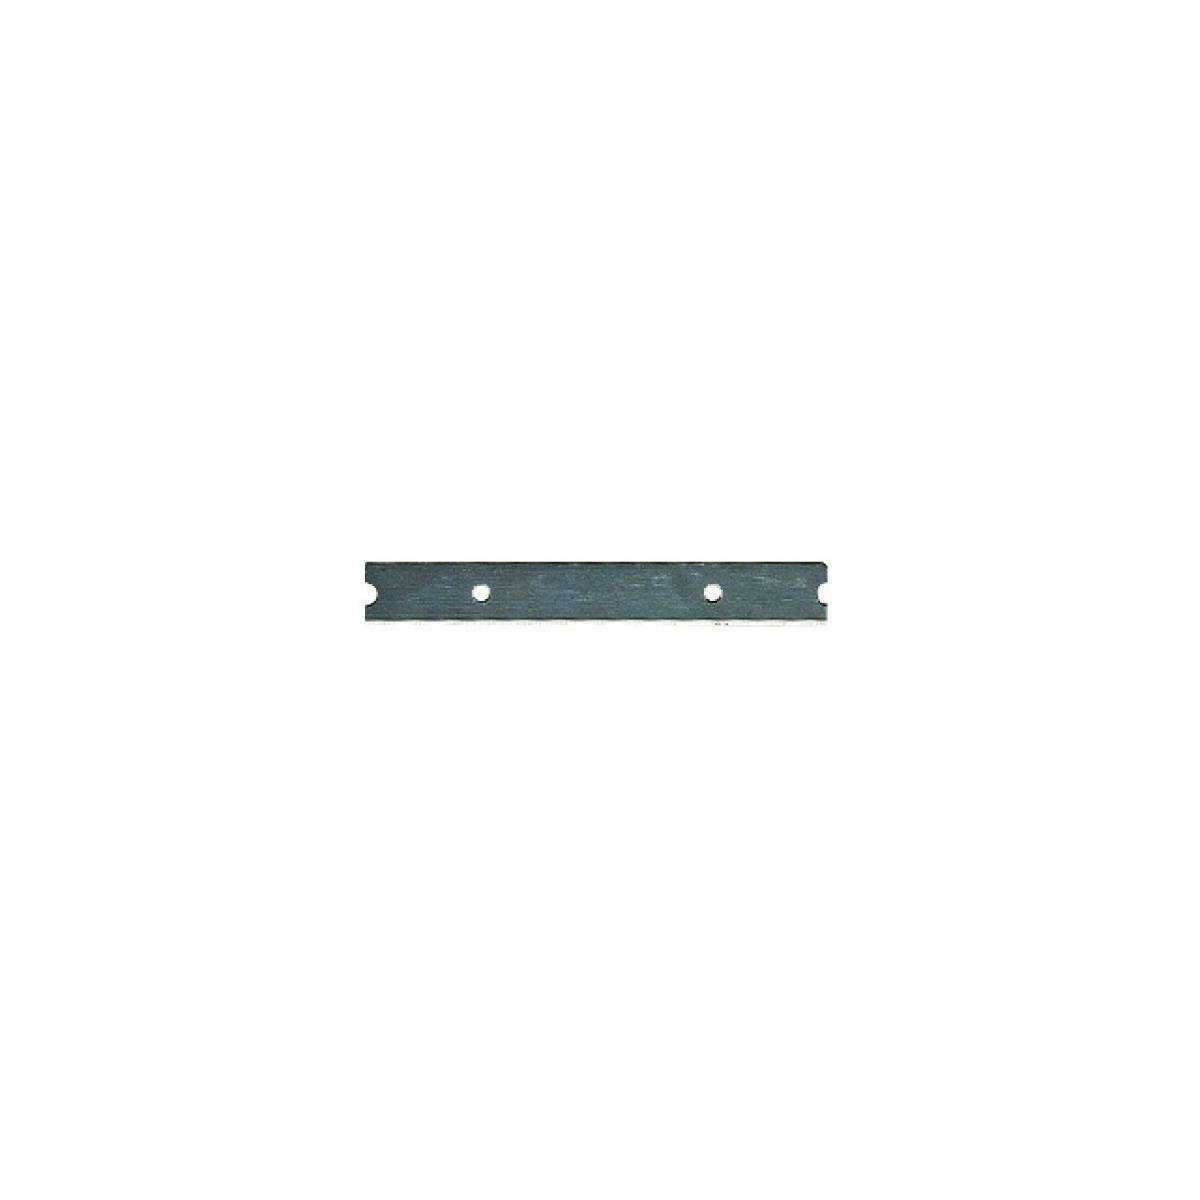 Набор лезвий для скребка Best 25шт 8580 TTS